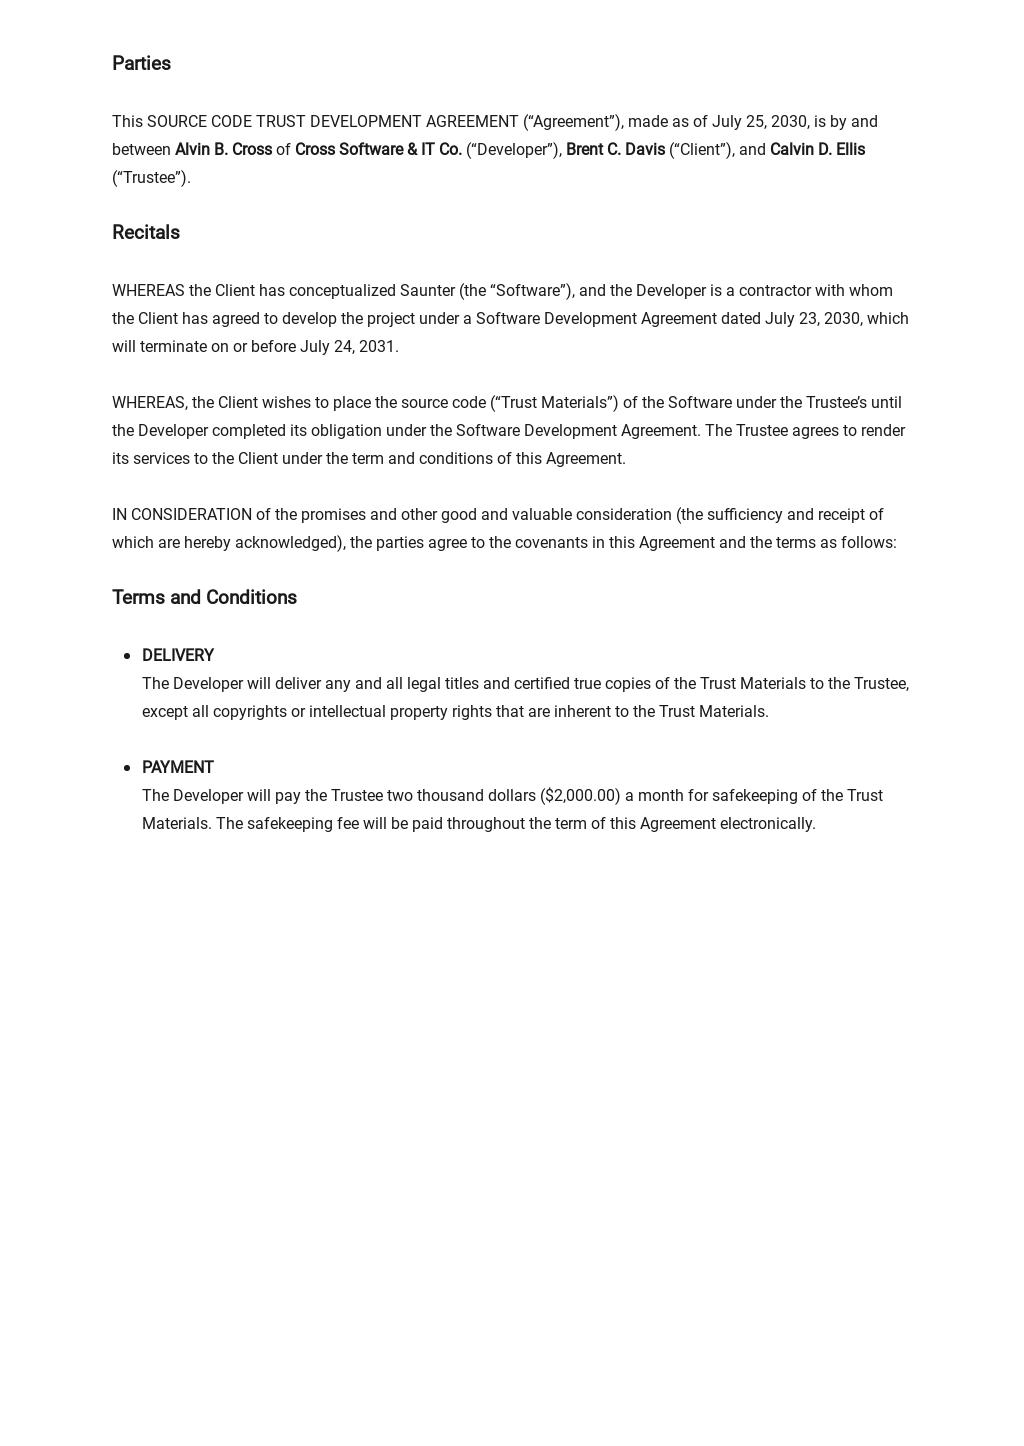 Source Code Trust Agreement Development Template 1.jpe